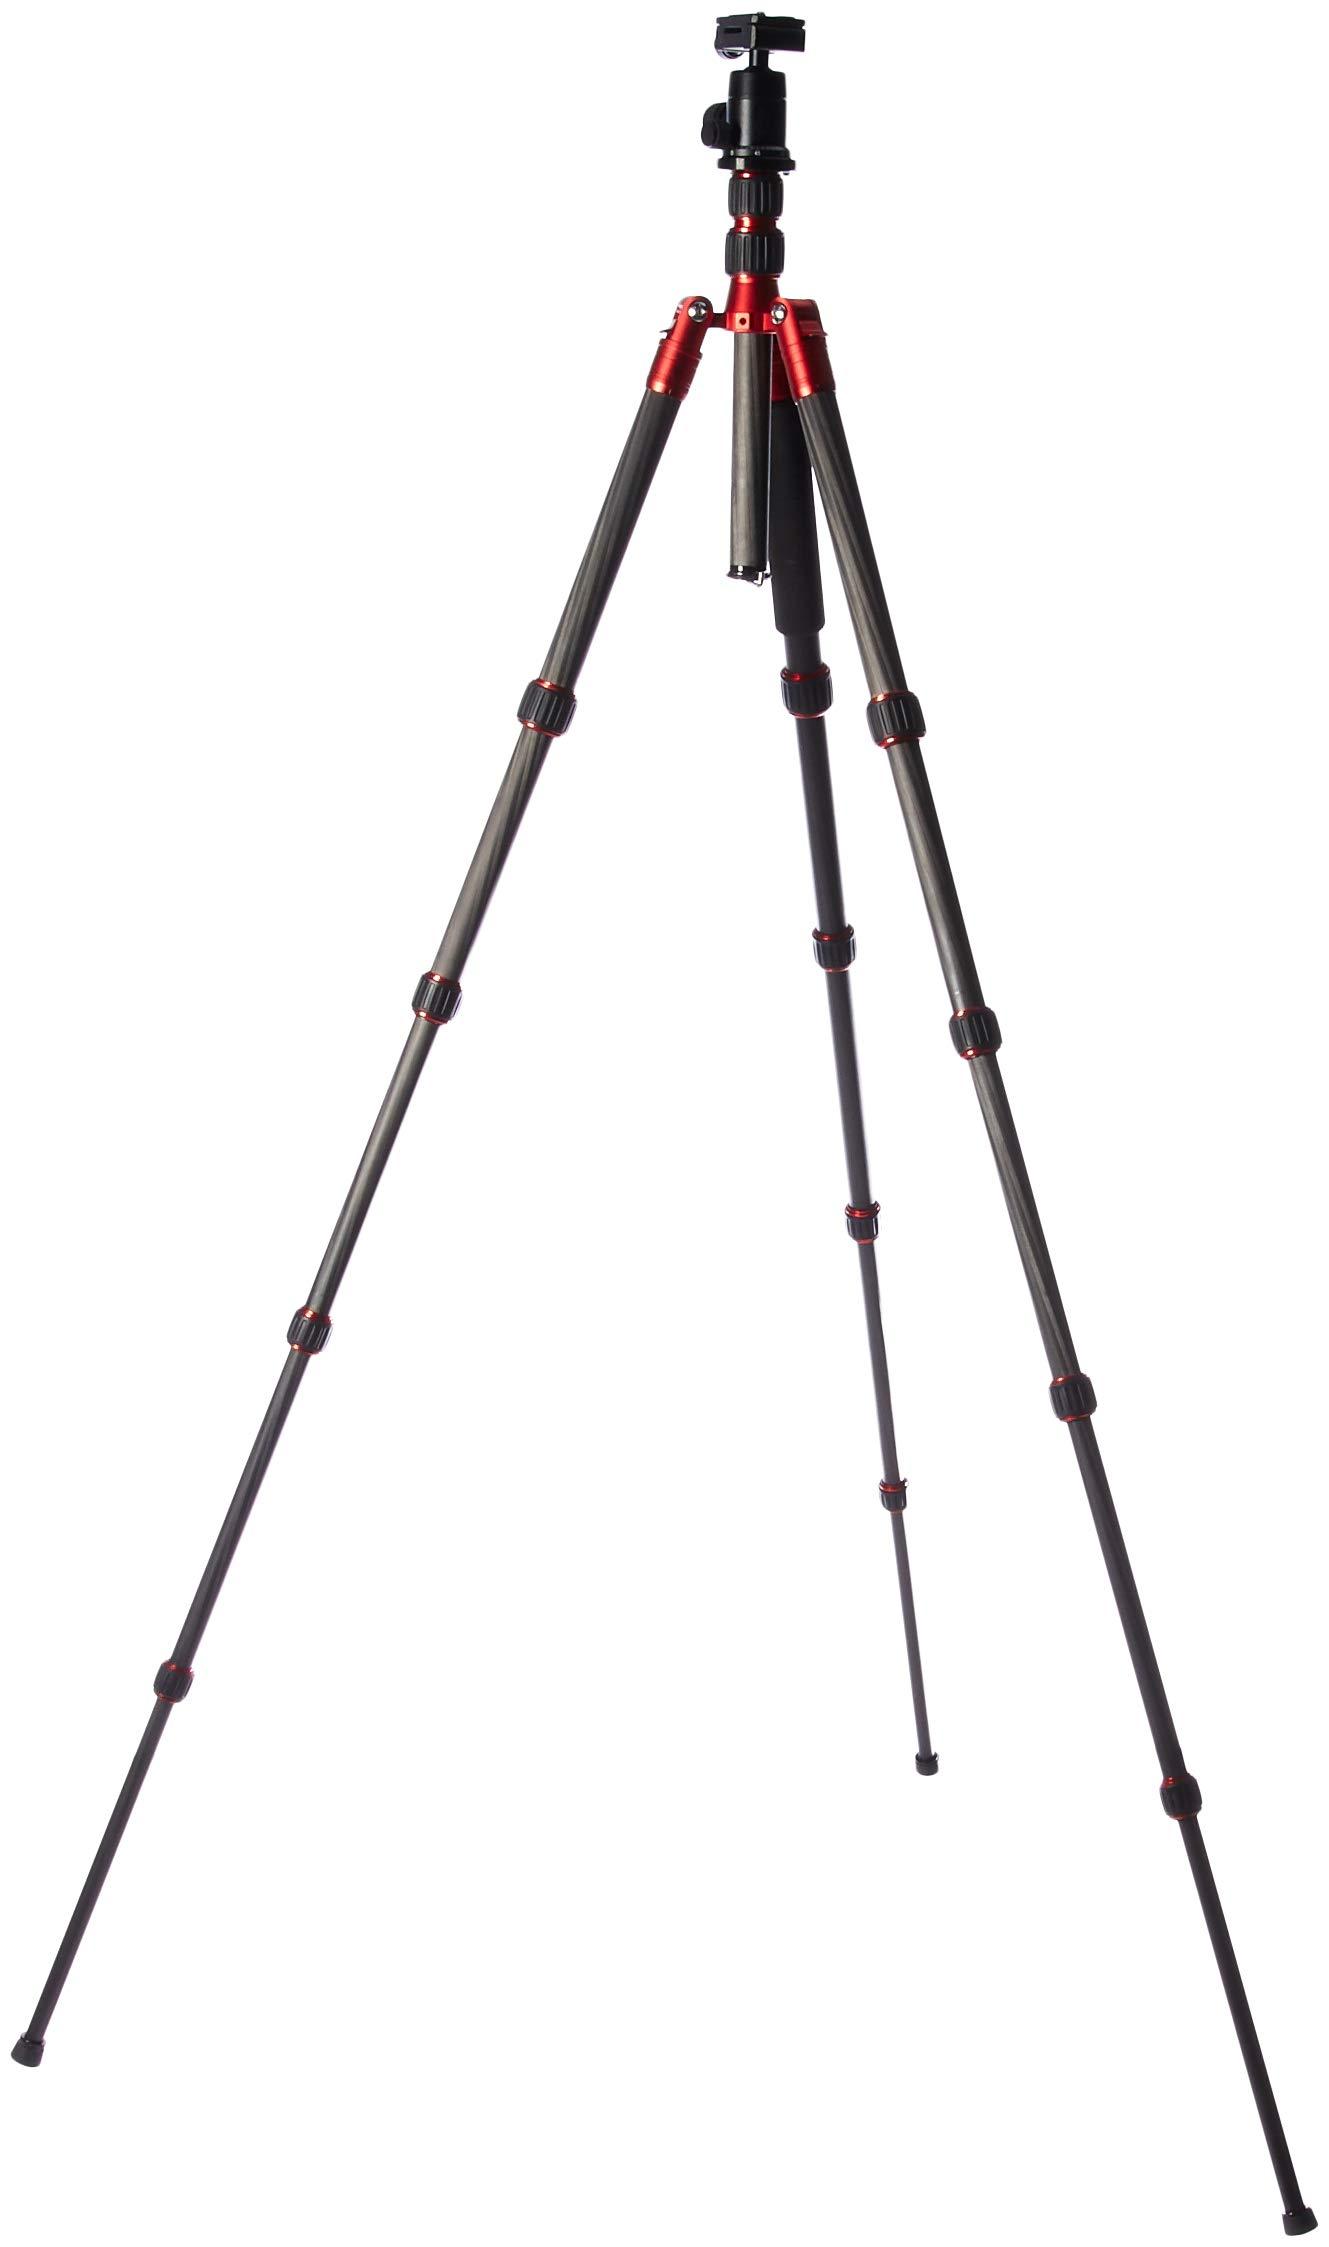 TERRA FIRMA TRIPODS T-CF500-BH200 Carbon Fiber 5 Section Tripod Leg Set with Ball Head BH200, Black/Red by TERRA FIRMA TRIPODS (Image #2)